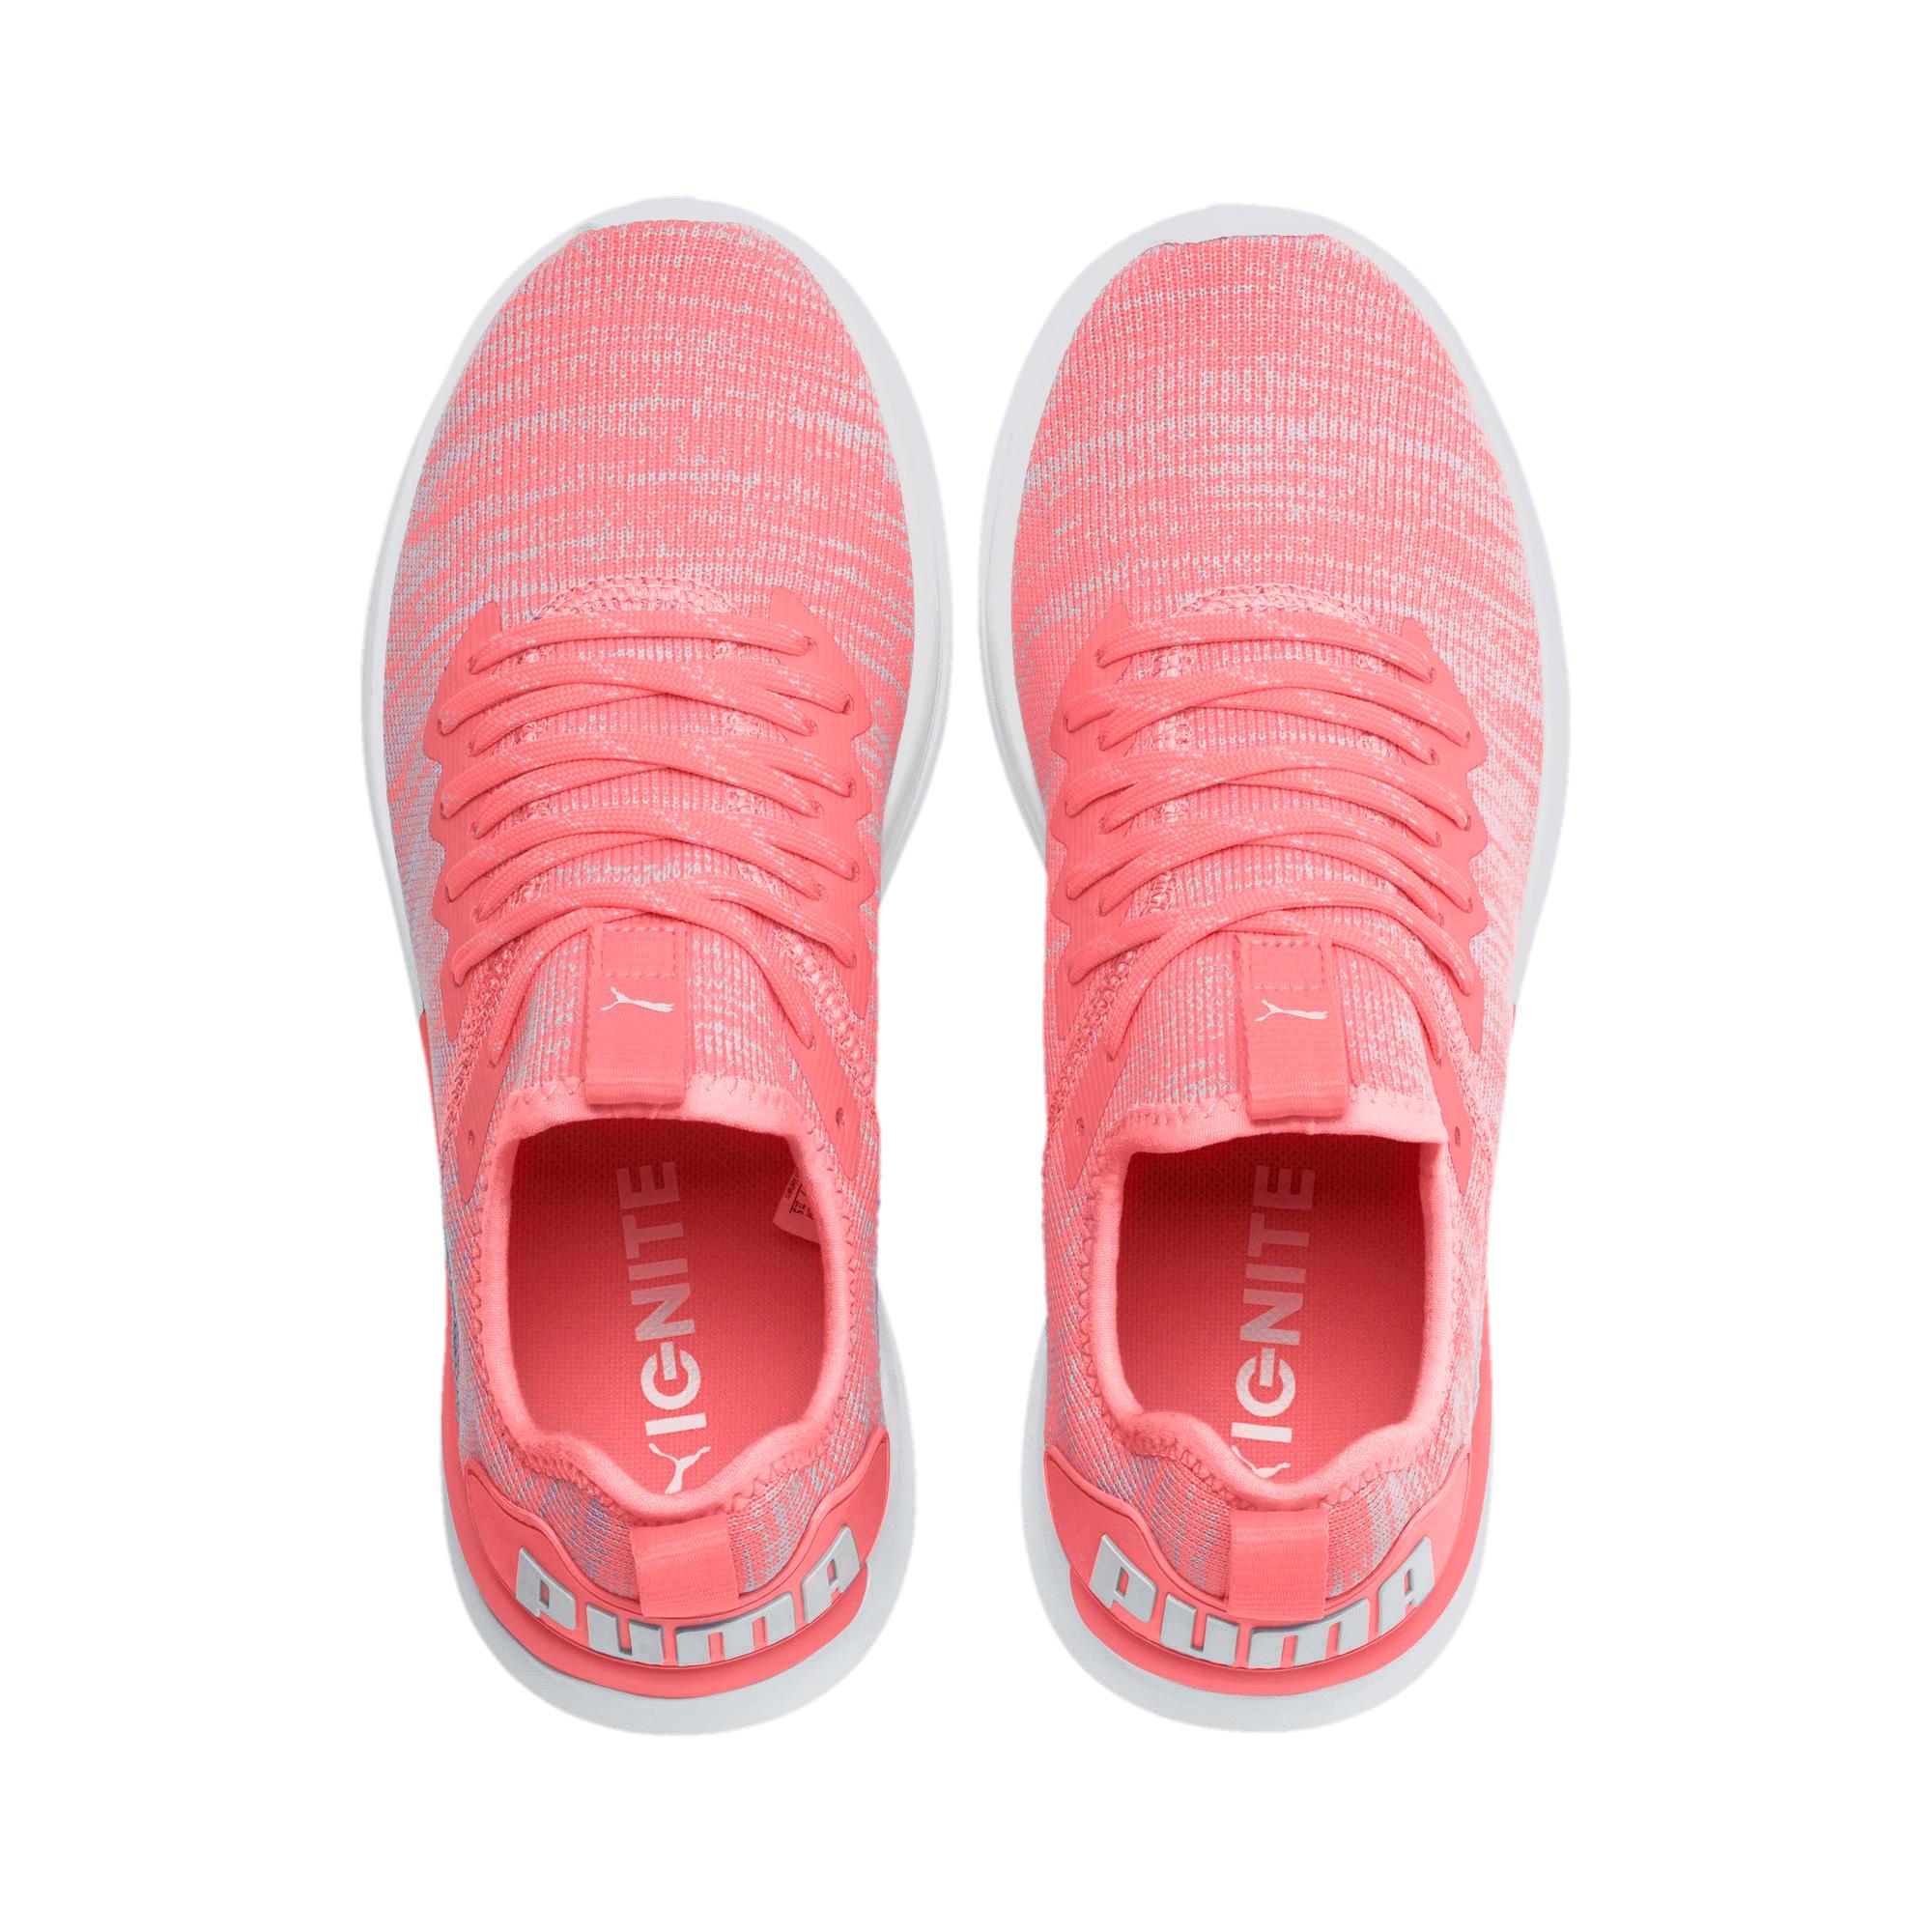 Thumbnail 7 of IGNITE Flash evoKNIT Women's Running Shoes, Bright Peach-Puma White, medium